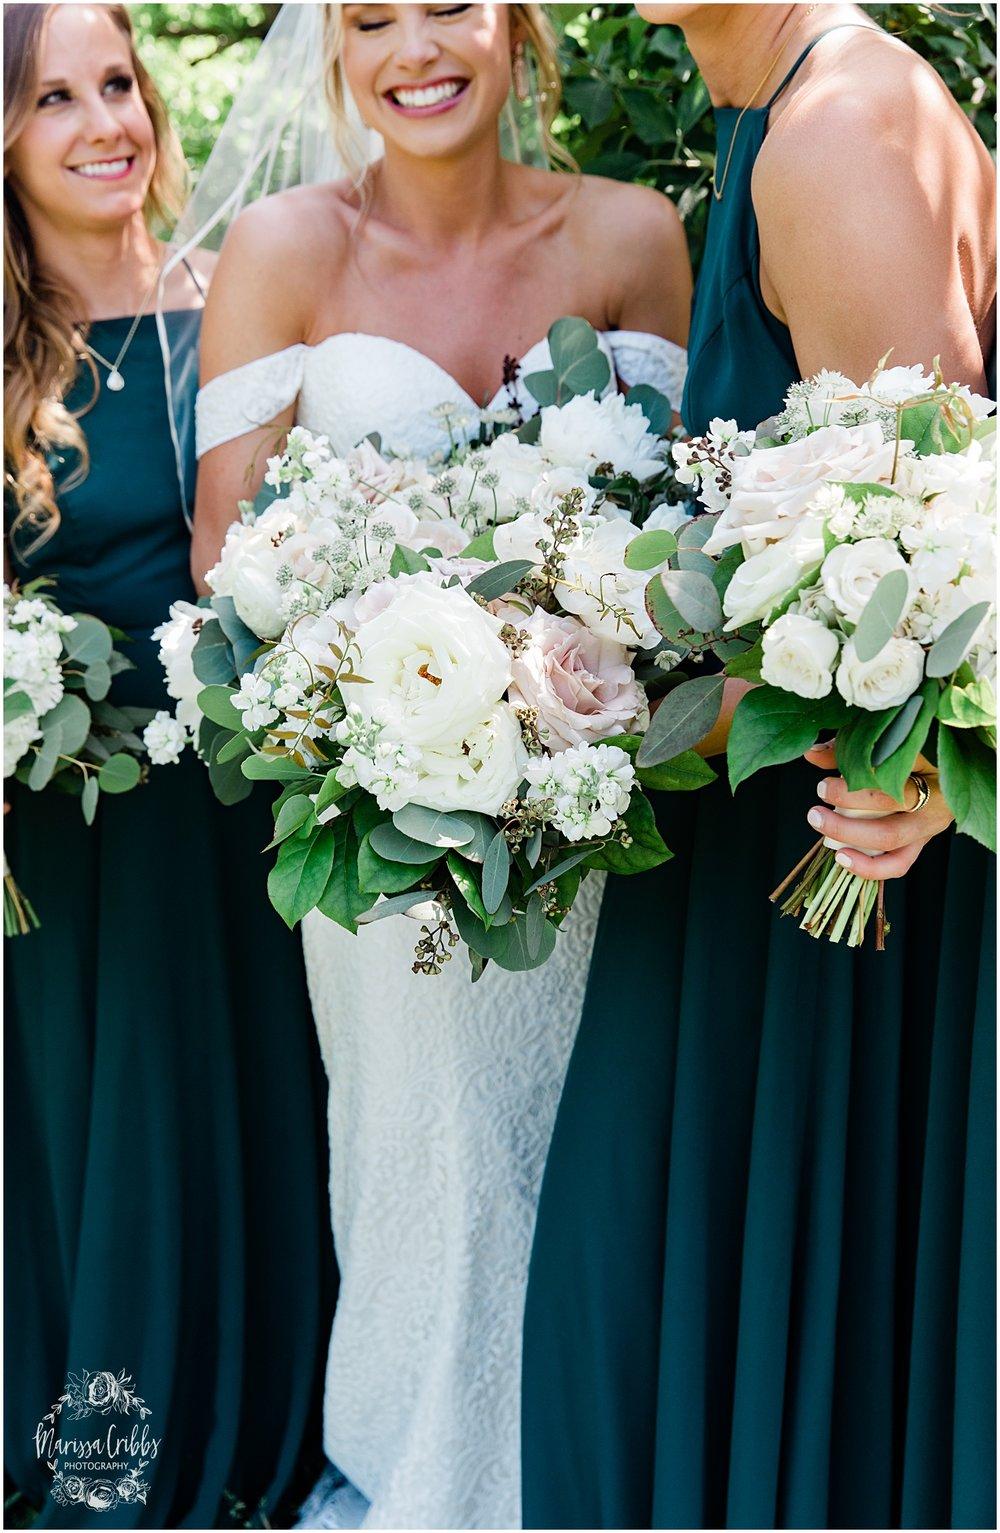 RHODES WEDDING | WESTON RED BARN FARM | MARISSA CRIBBS PHOTOGRAPHY_5258.jpg